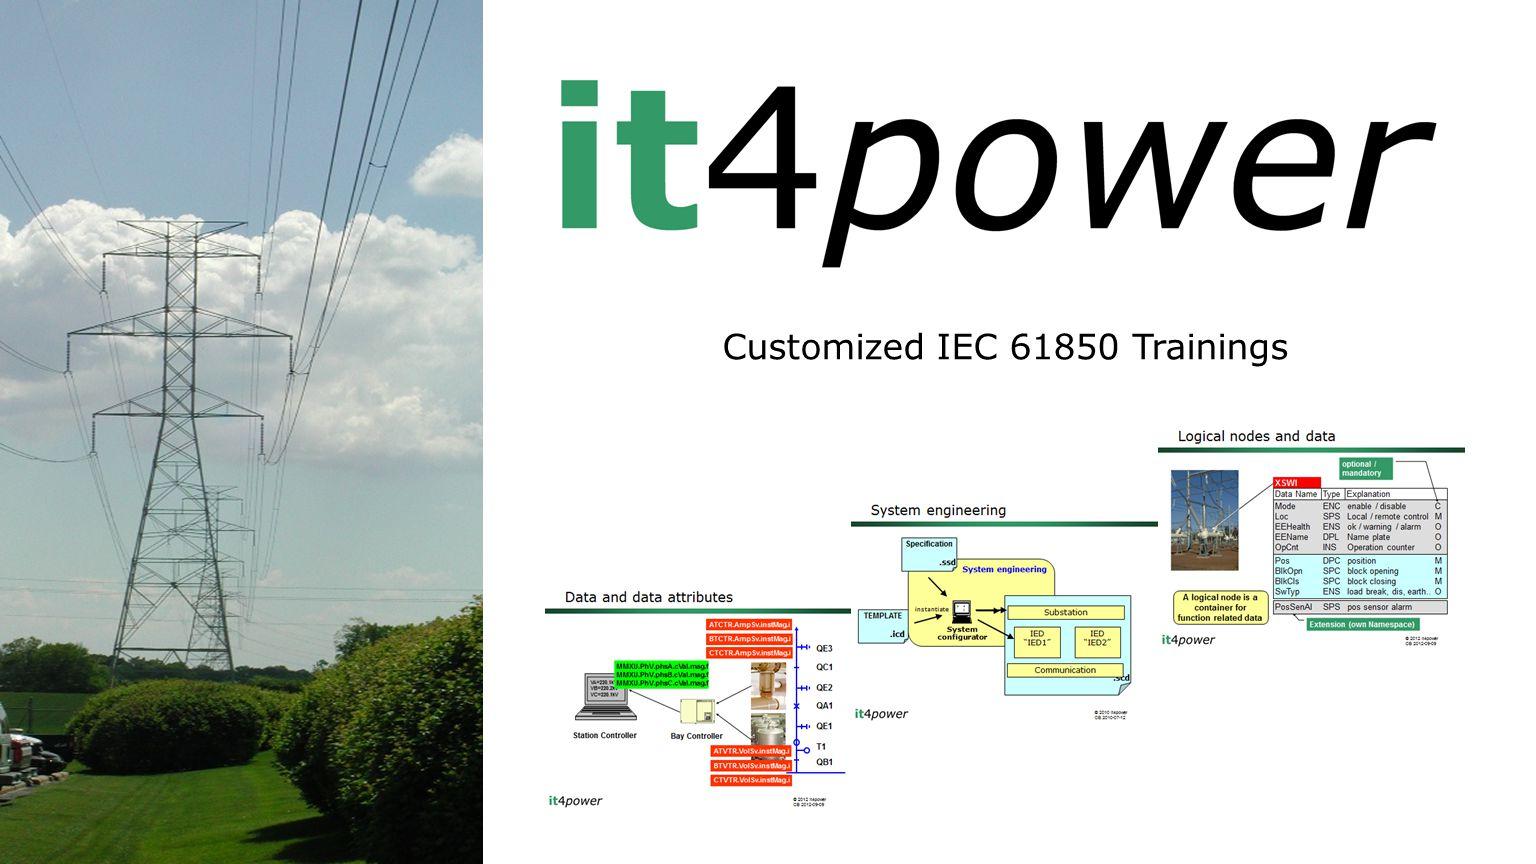 Customized IEC 61850 Trainings